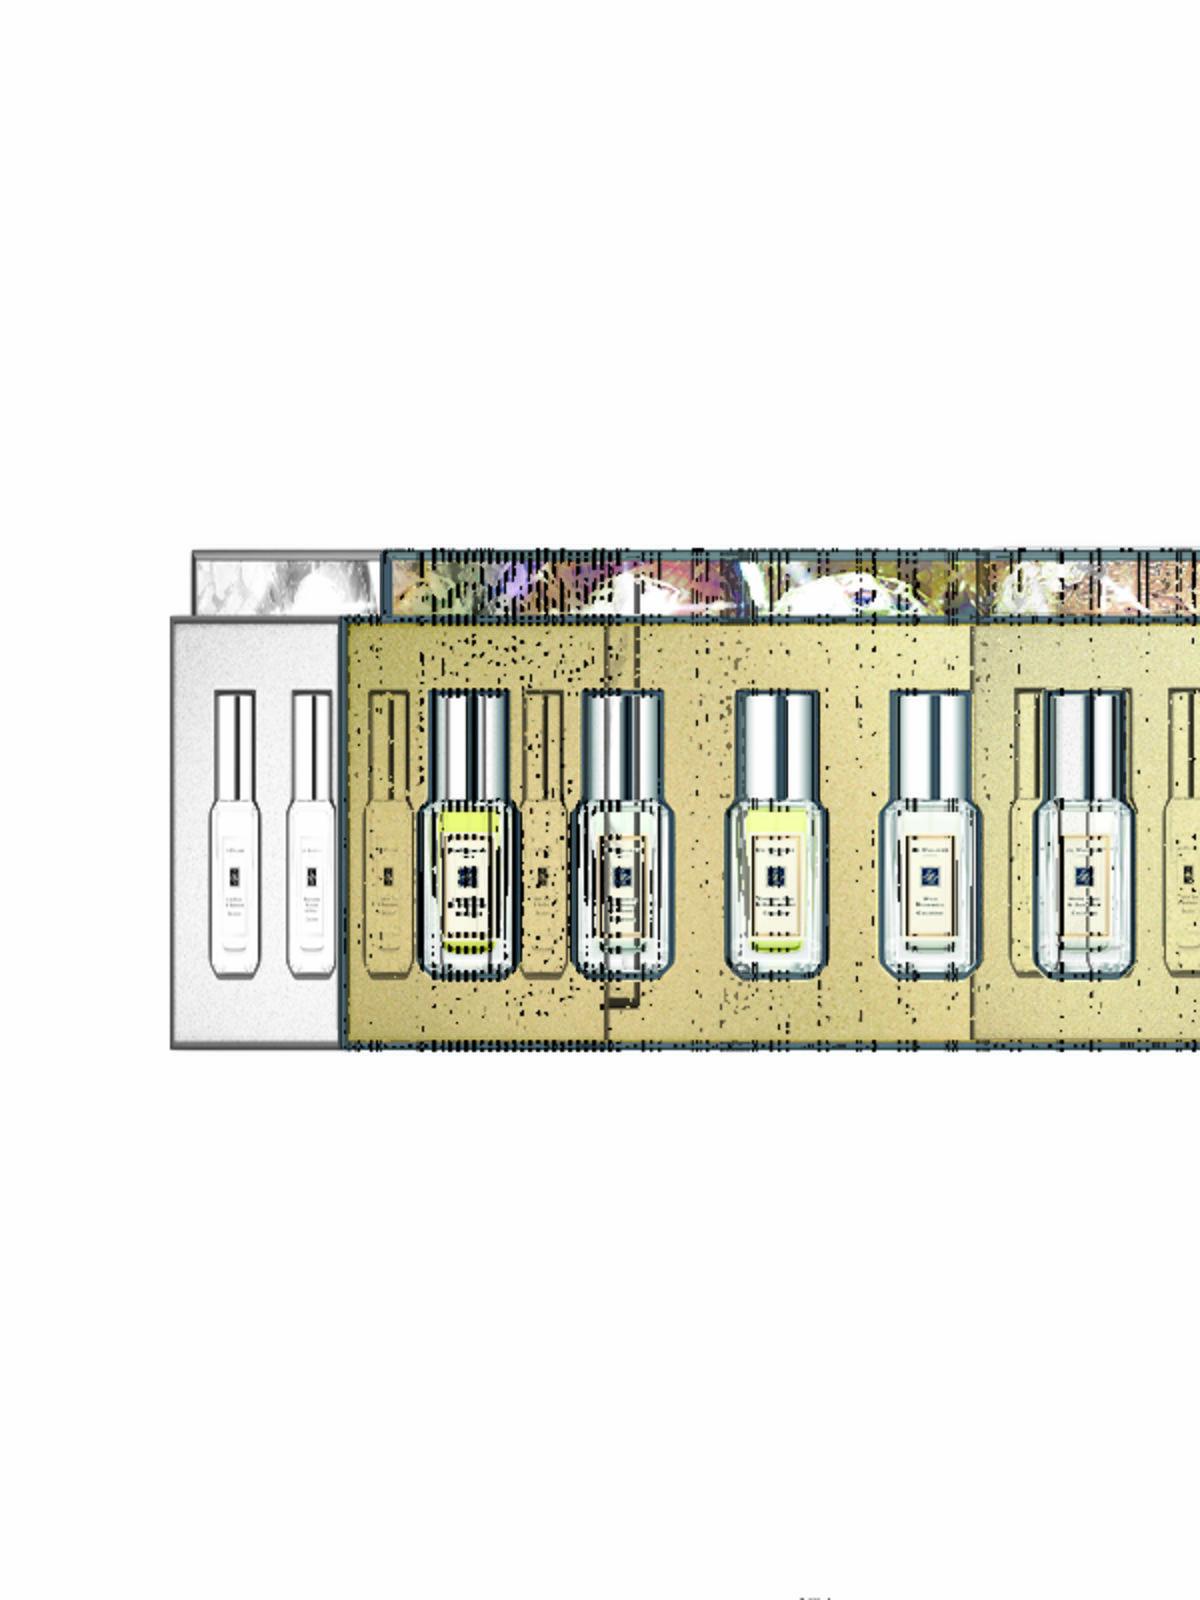 Zestaw zapachowy Cologne Collection, Jo Malone London, 369 zł  (Douglas)